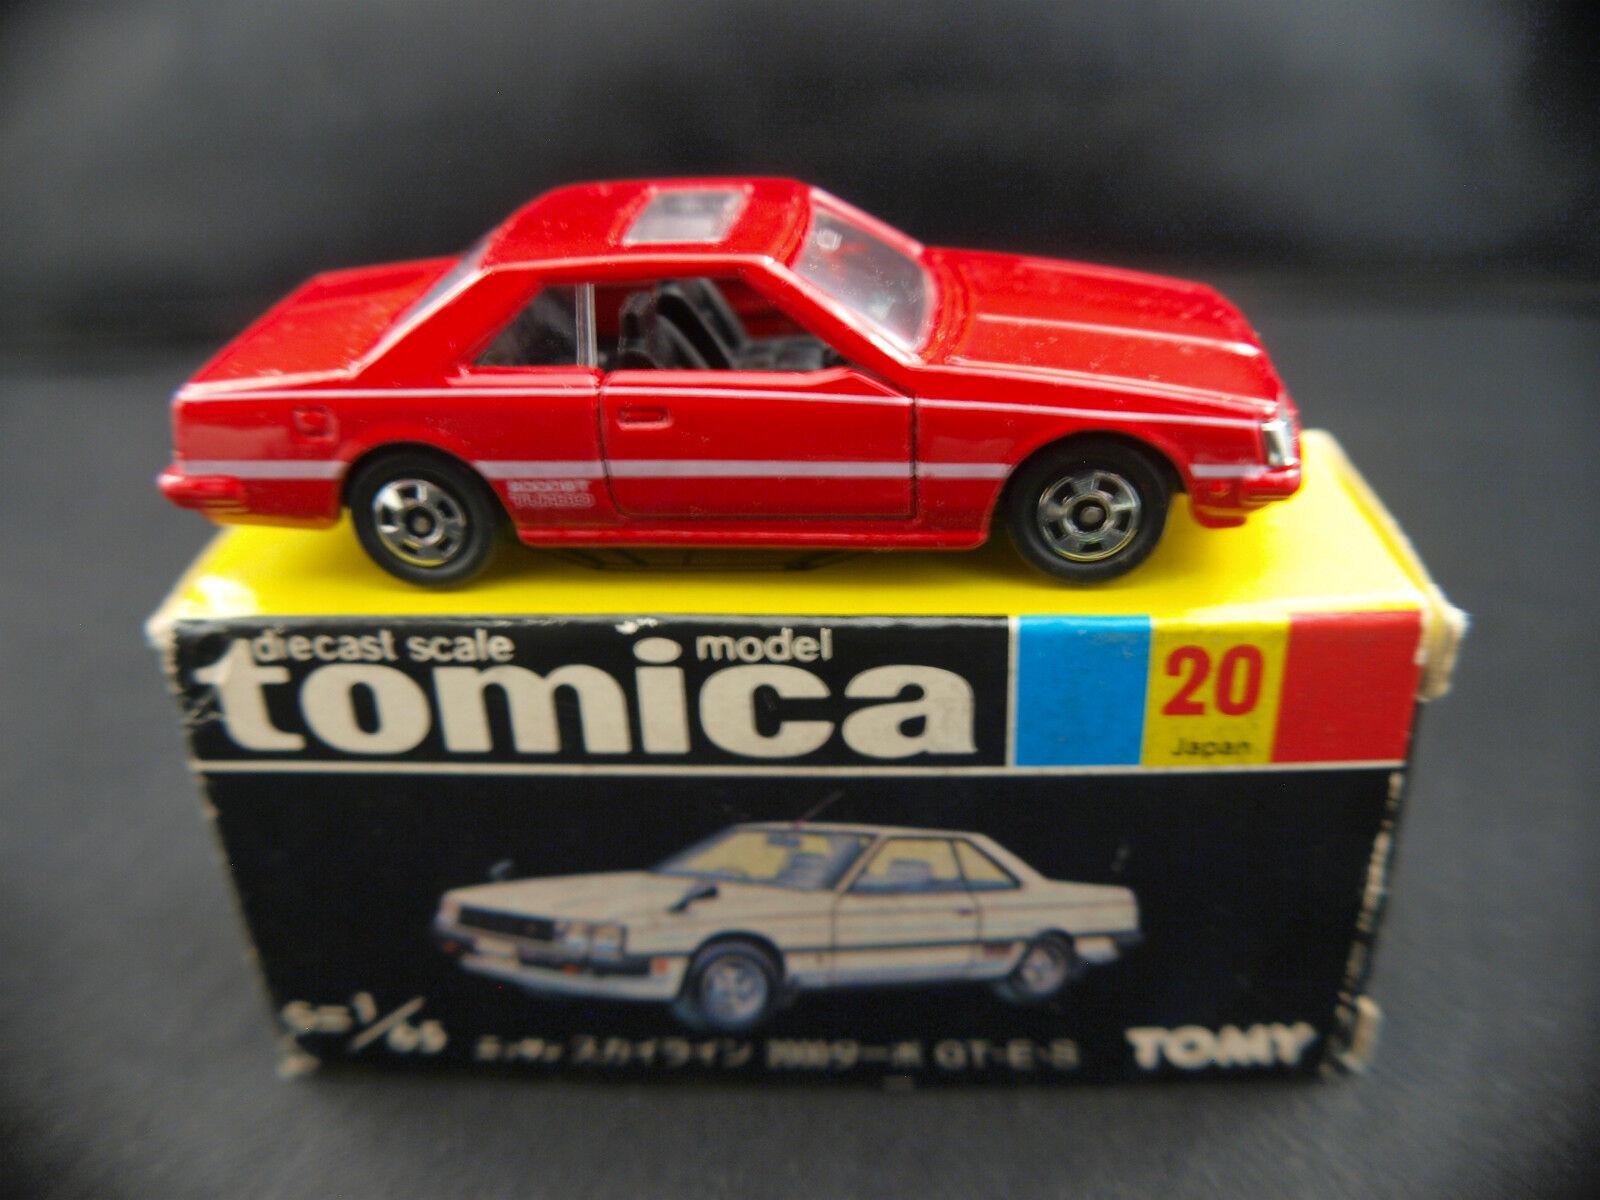 Tomica Tomy Japon n° 20 Nissan Skyline 2000 Turbo neuf en boîte 1 65 Mint in box